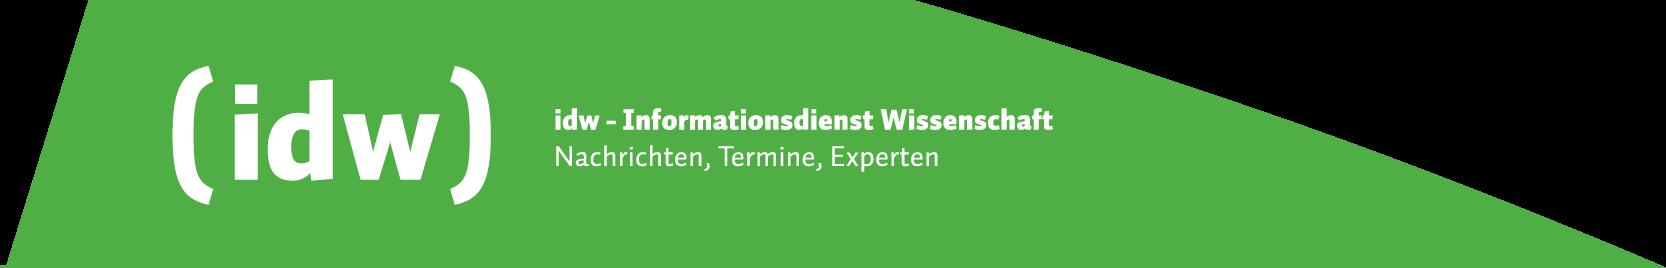 https://www.idw-online.de/images/idw_logo_gruen.png